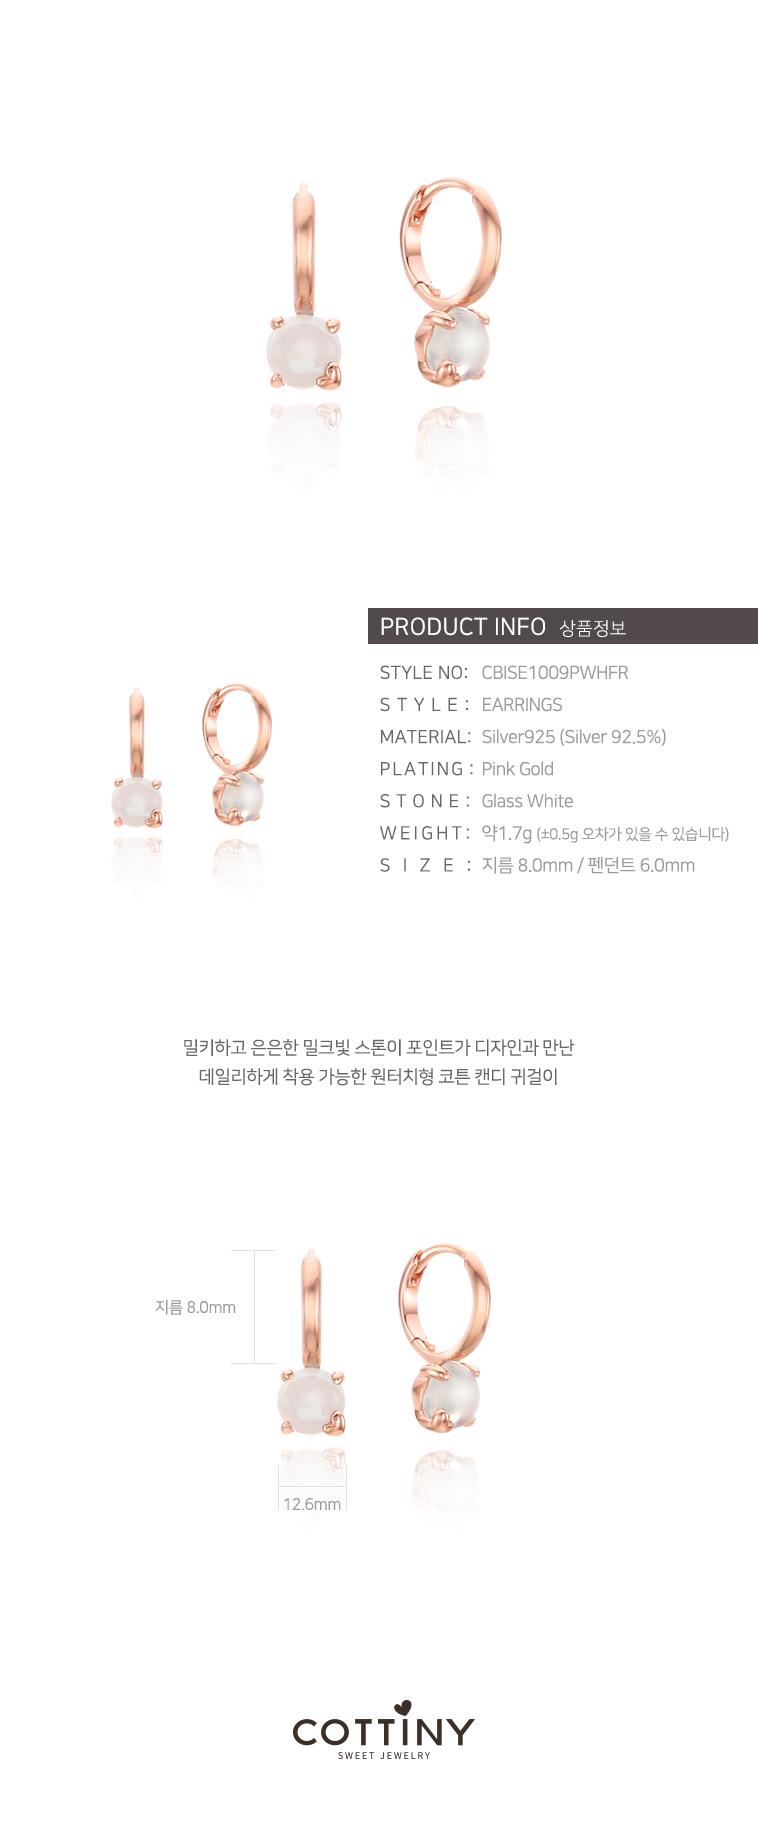 CBISE1009PWHFR - 코티니, 42,000원, 진주/원석, 드롭귀걸이